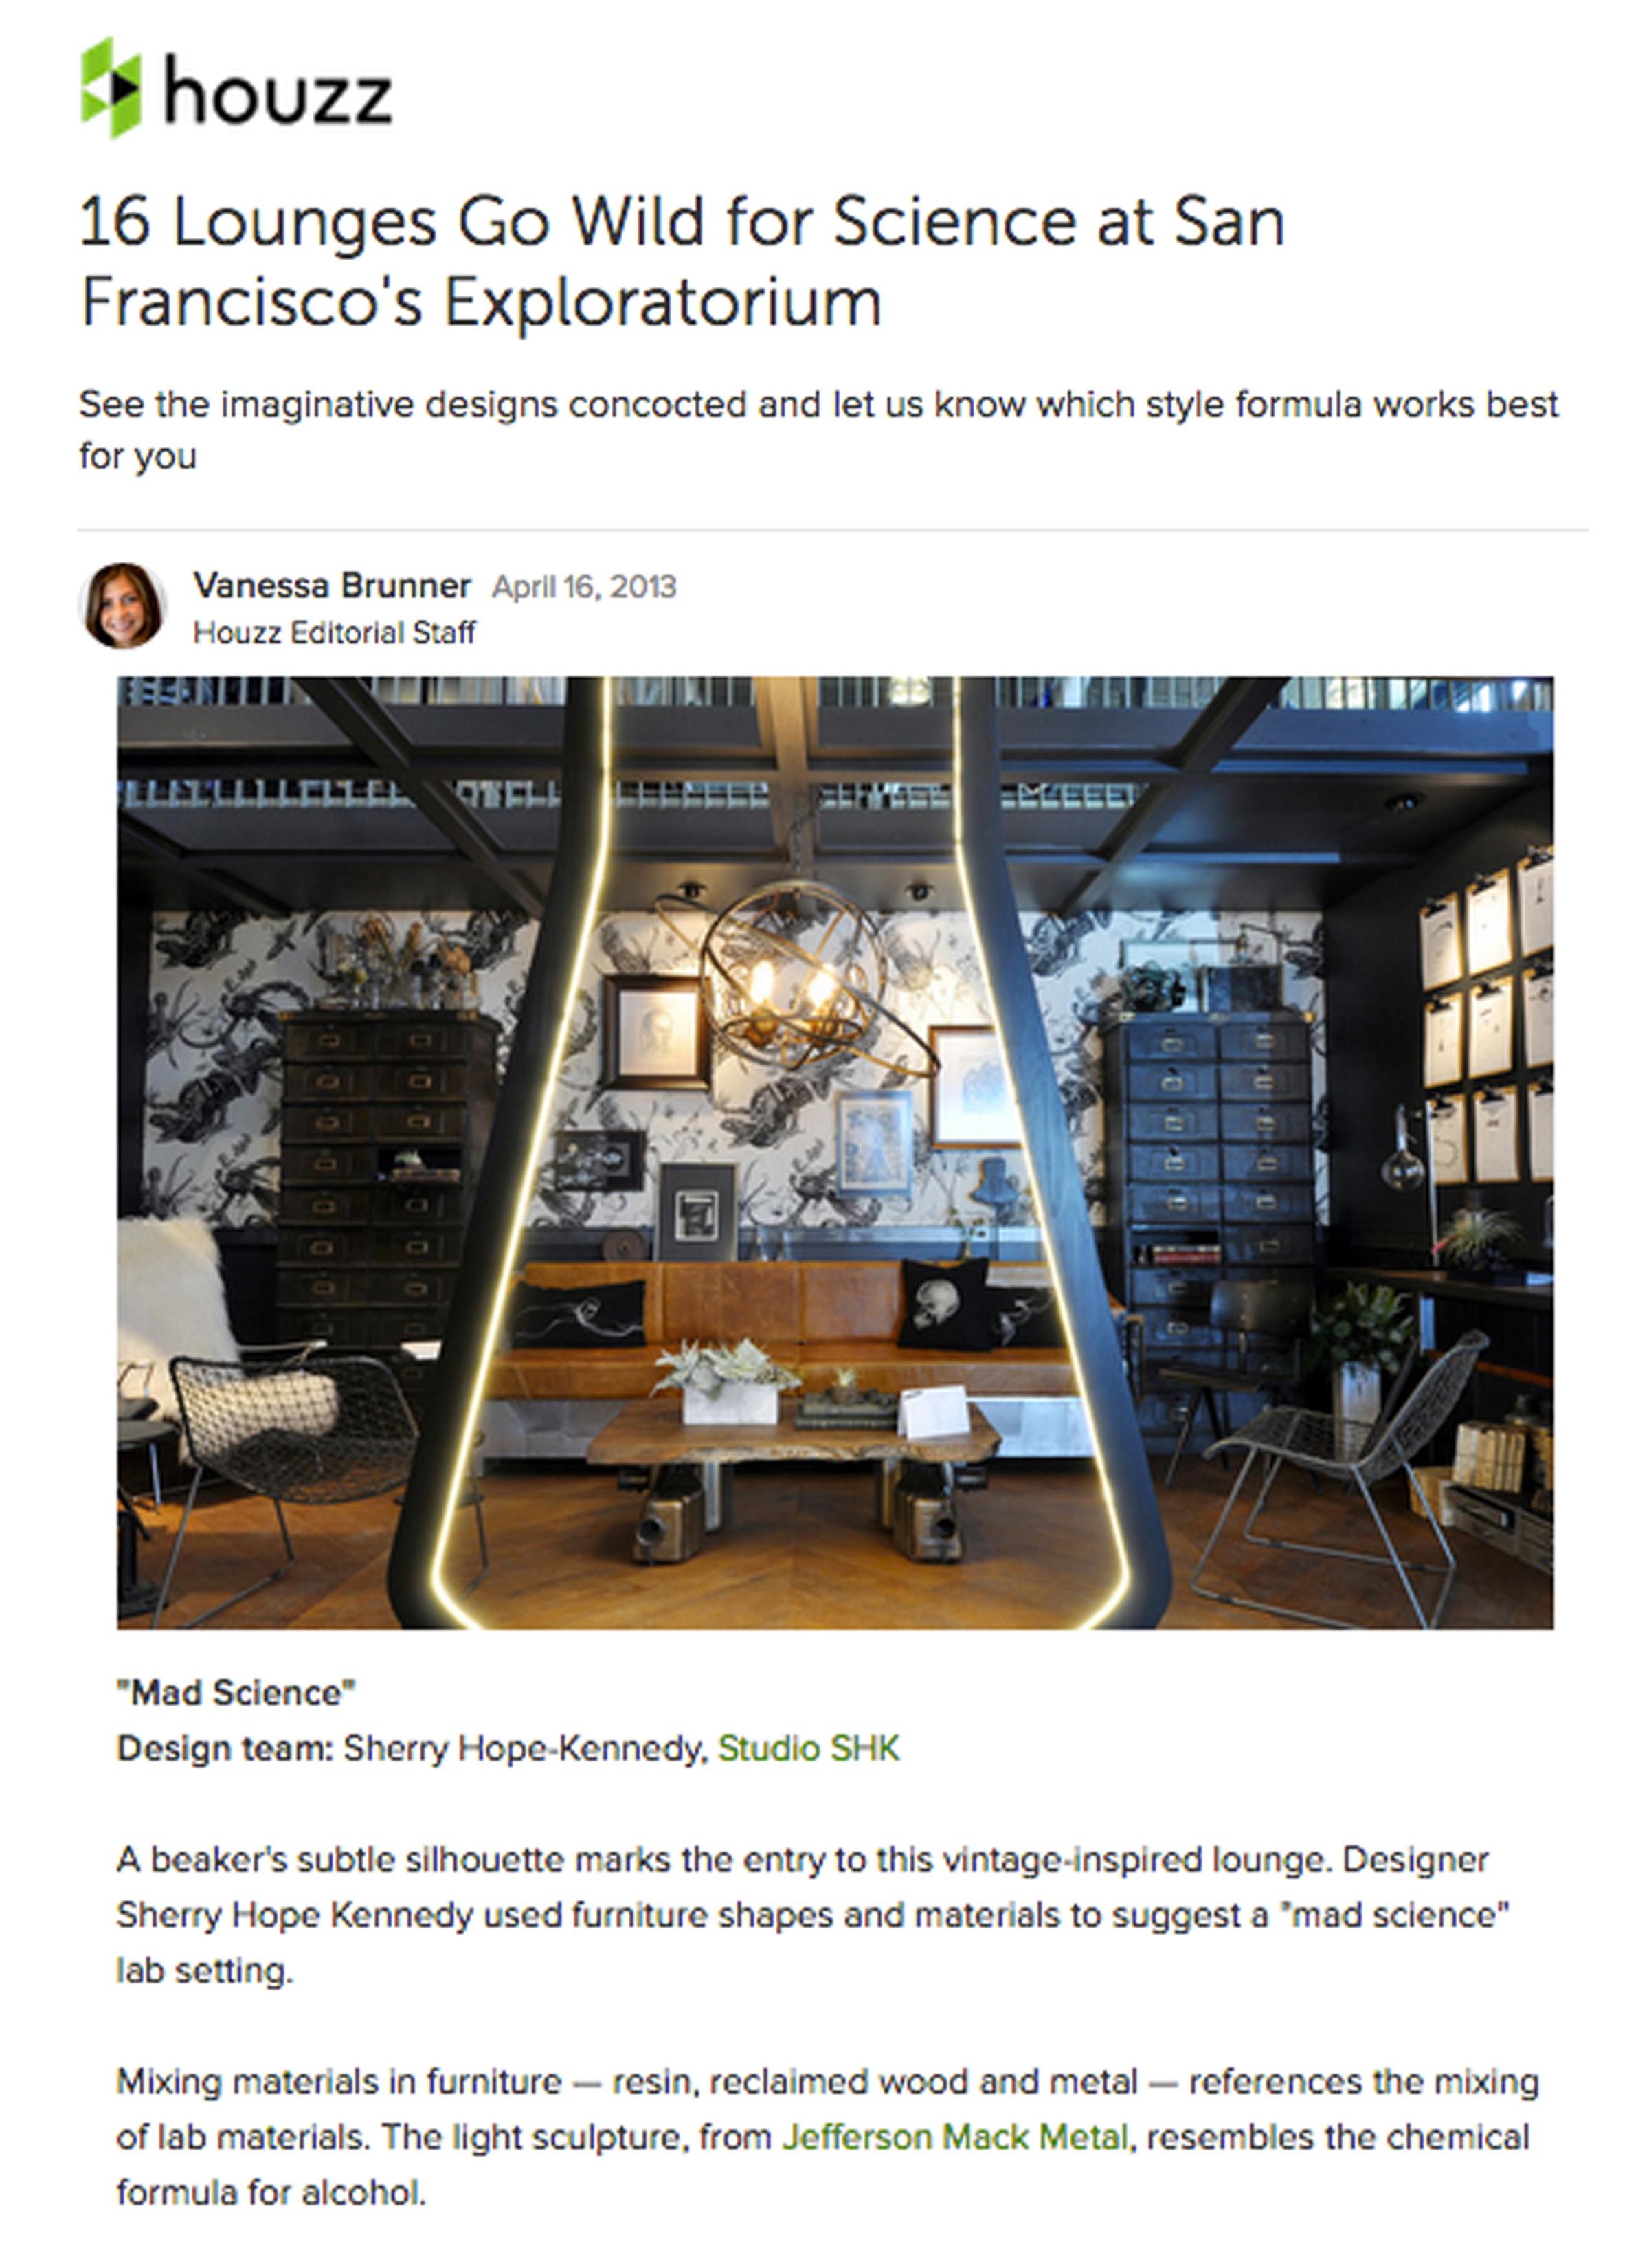 Houzz - Houzz spotlights Sherry's space at the Exploratorium Designer Showcase. Link: http://bit.ly/2qUDPks